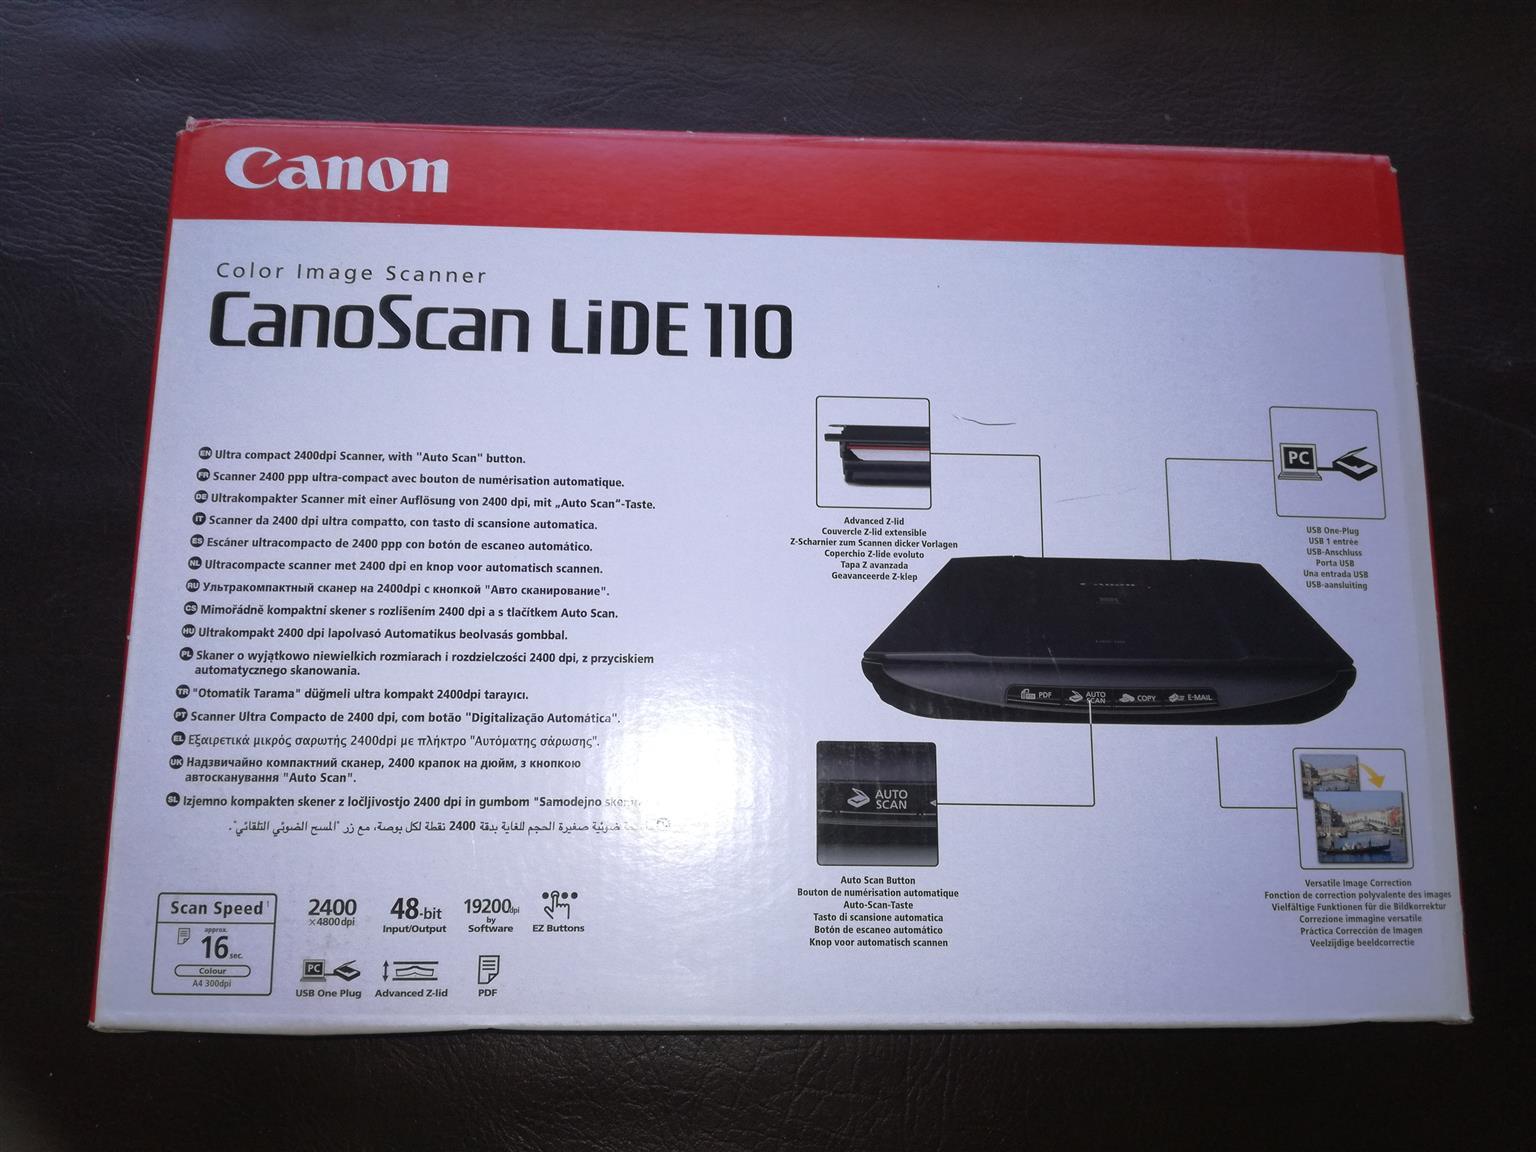 LG GP60 Ultra Slim External DVD Writer (QTY 11) + Logitech C270 Webcam (QTY  4) +Canoscan Lide 110 Scanner (QTY 4)